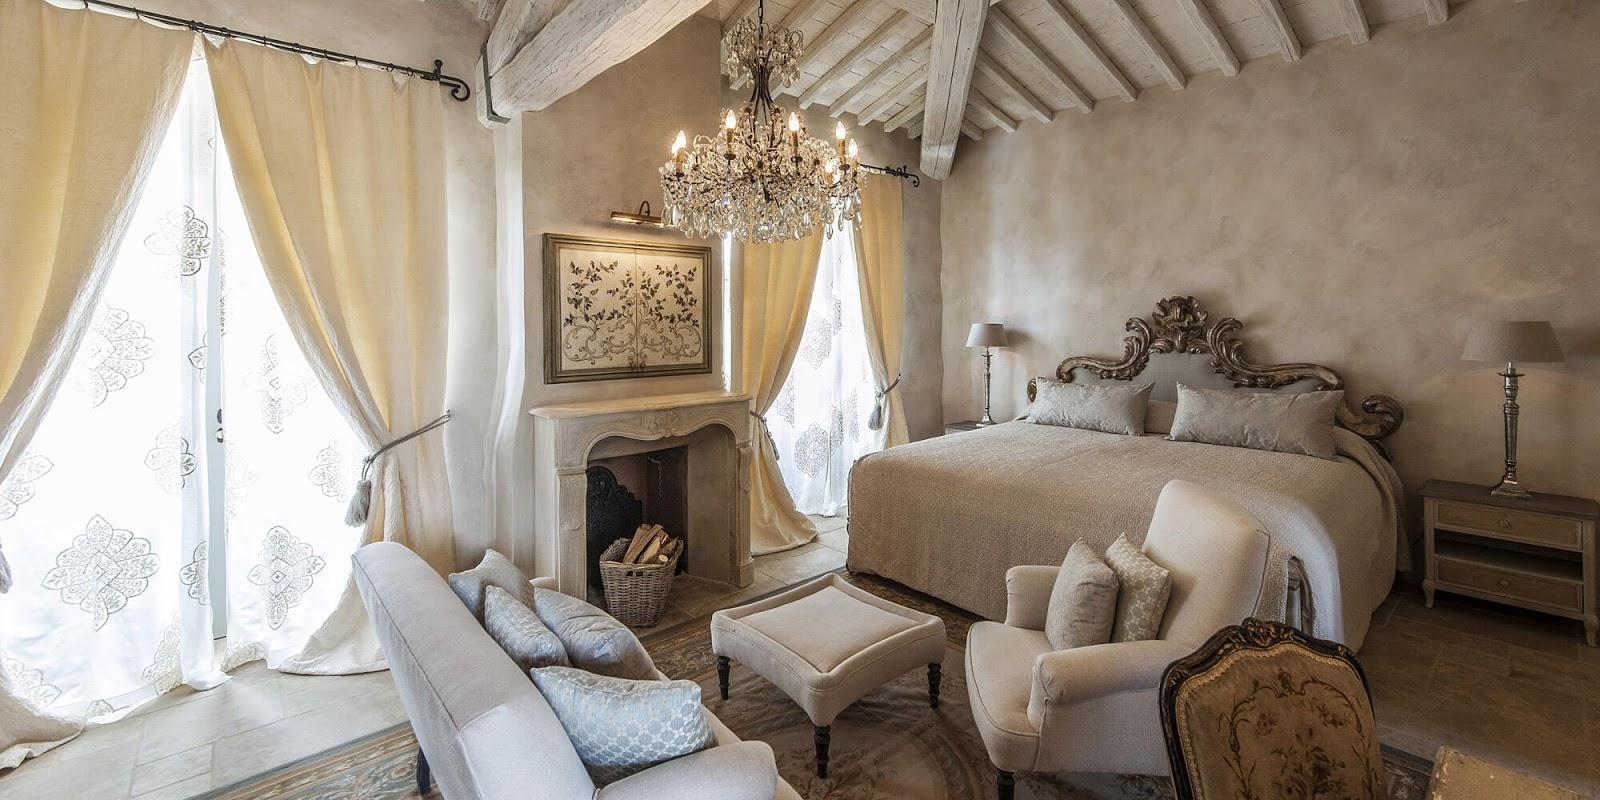 Breathtaking suite at of the Italian villa Borgo Santo Pietro - found on Hello Lovely Studio